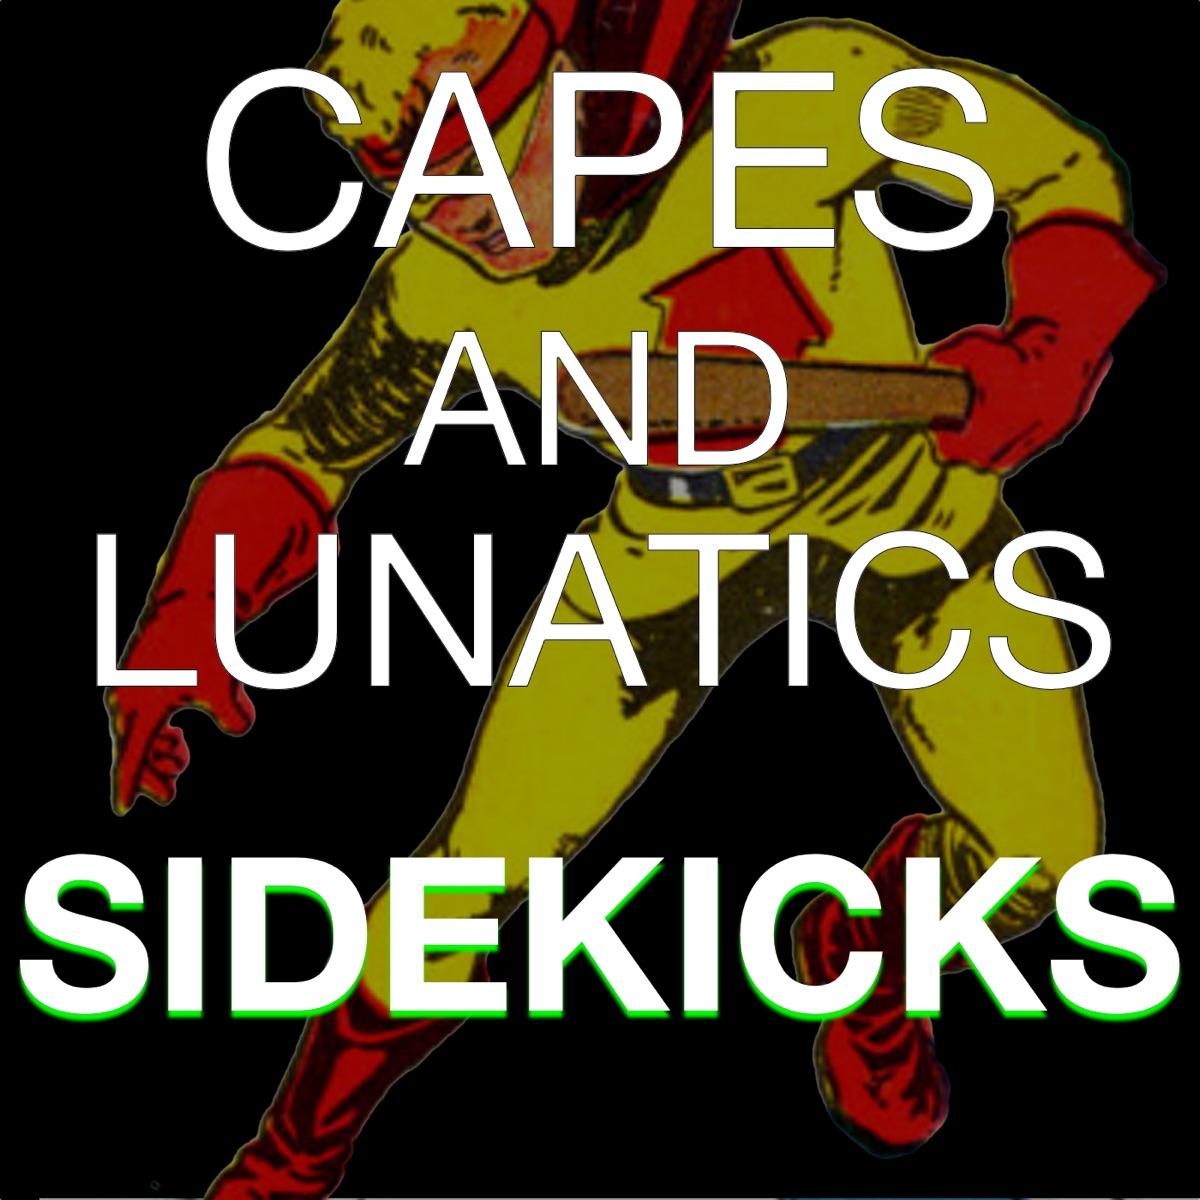 Capes and Lunatics Sidekicks